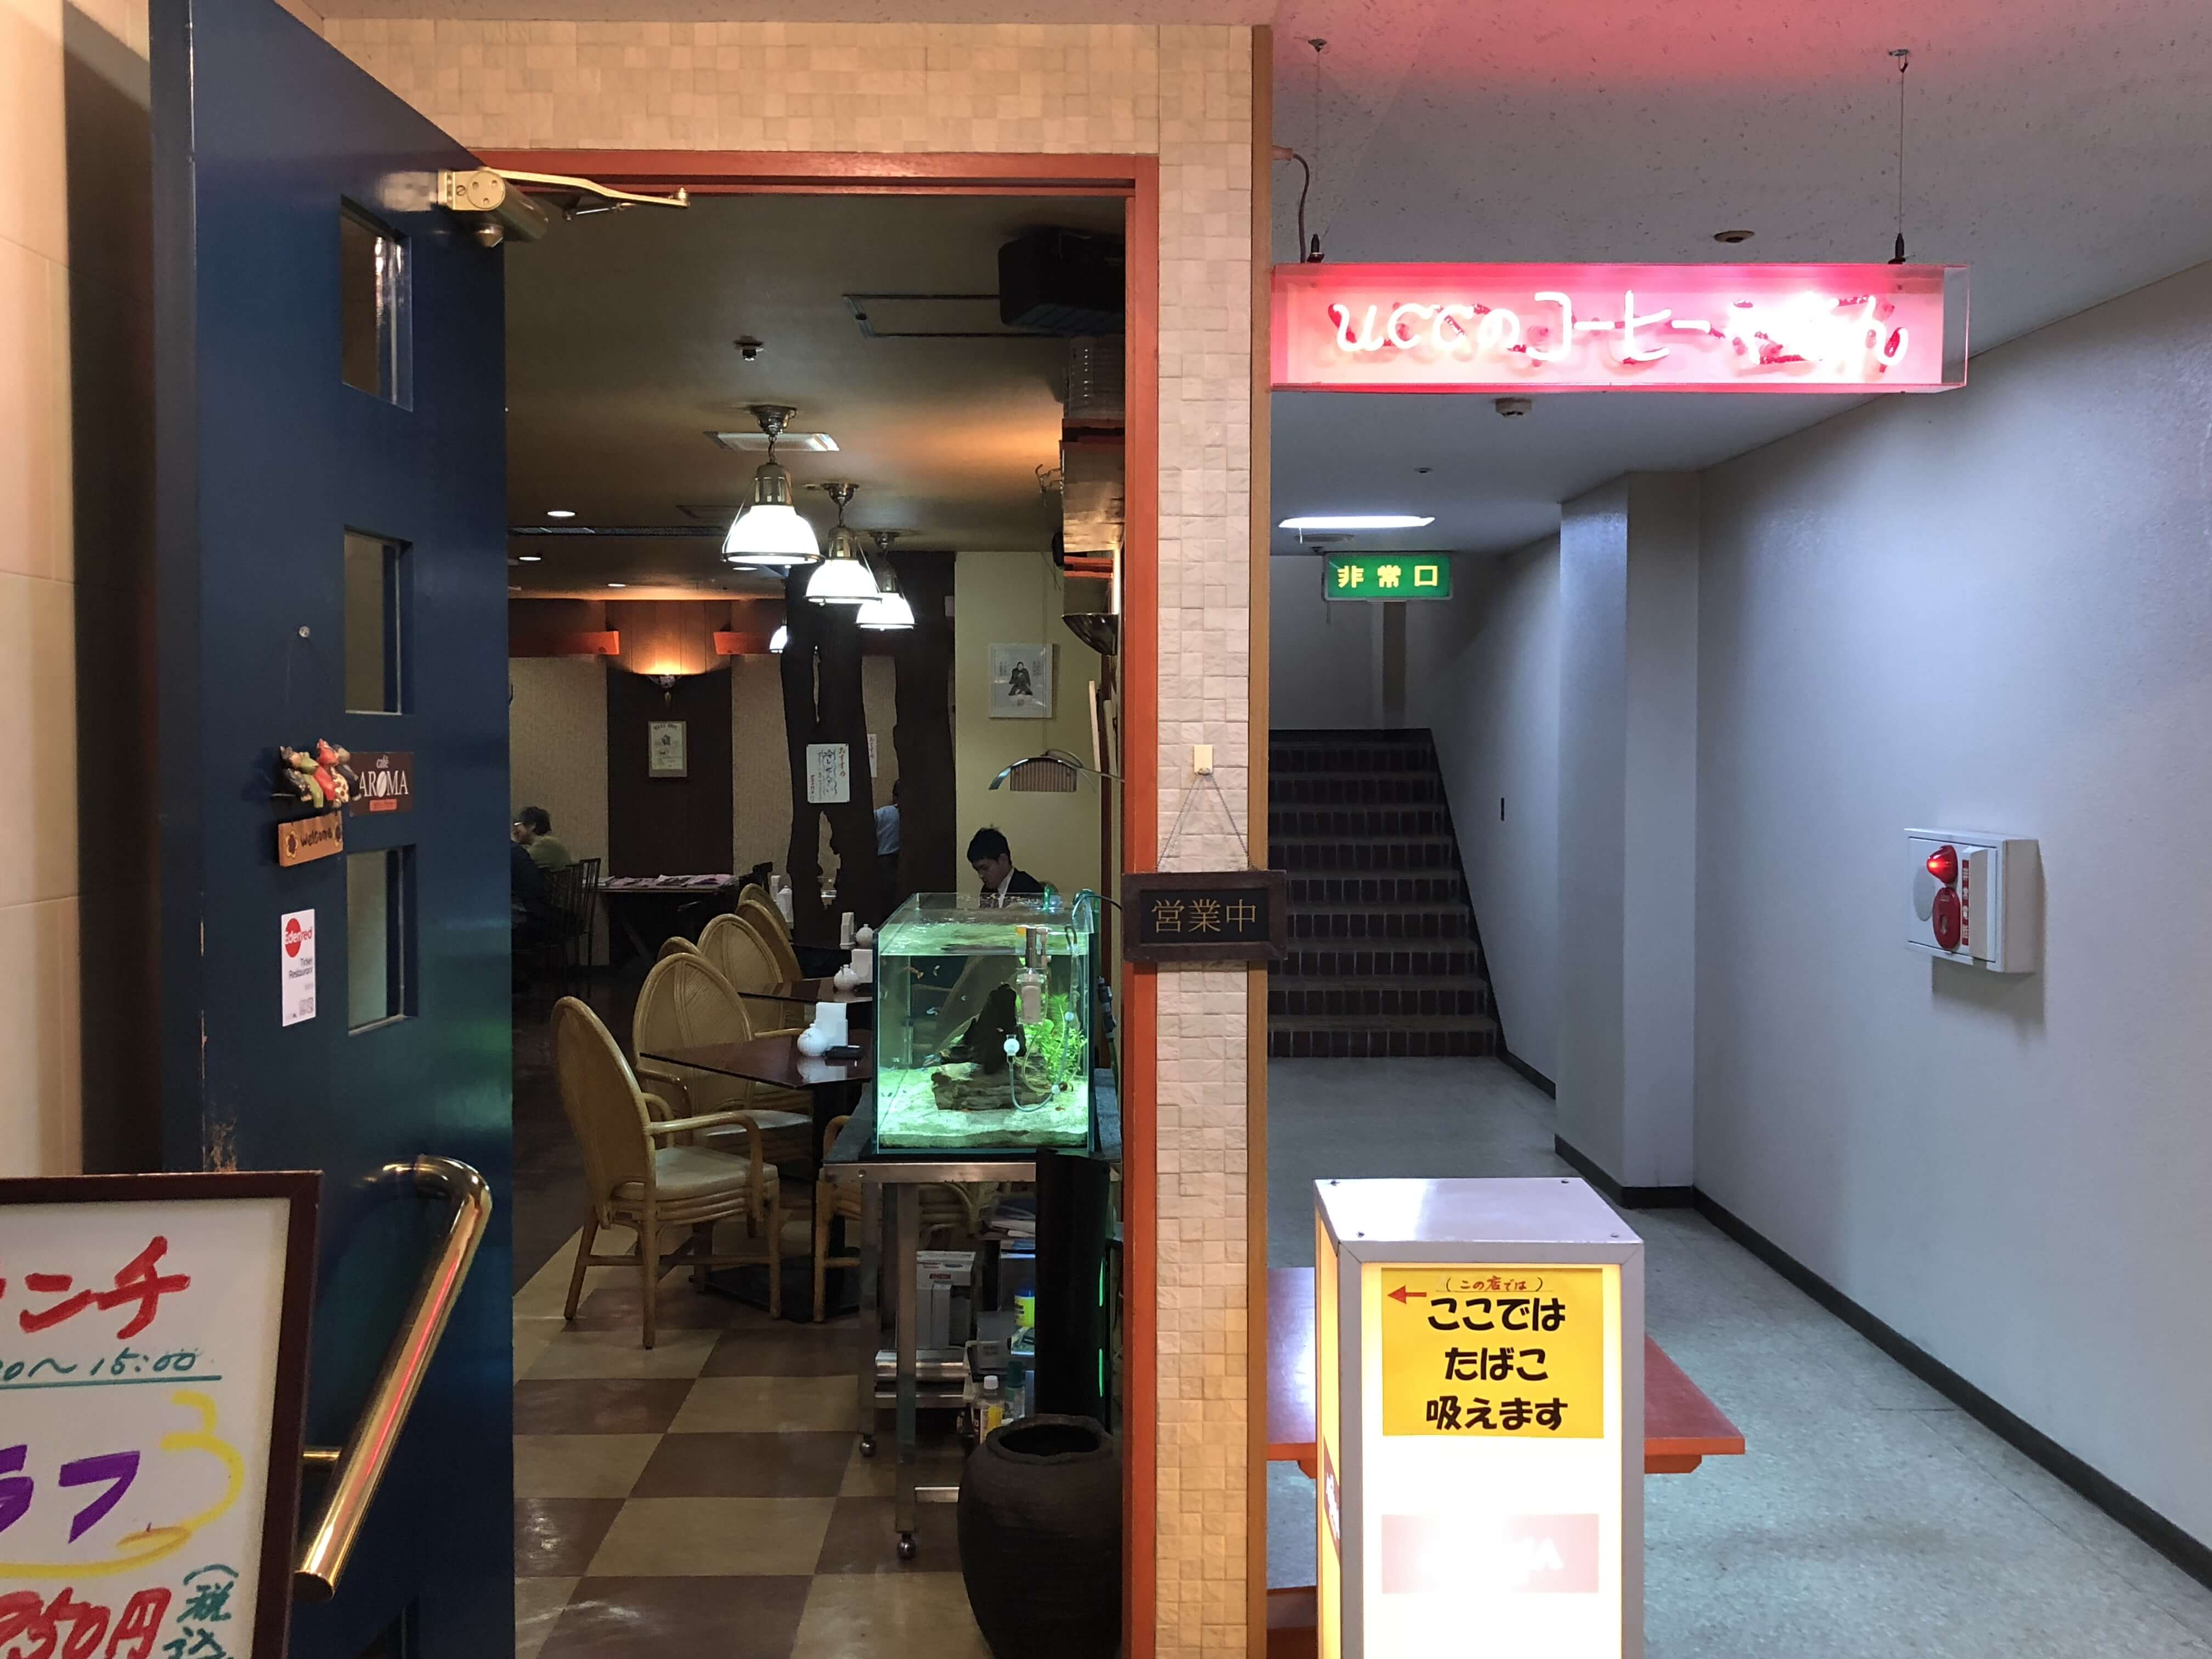 『 cafe AROMA (カフェ・アロマ)』エムザ地下奥の昔ながらの喫茶店。昔の金沢を知る人達の憩いの場 !!